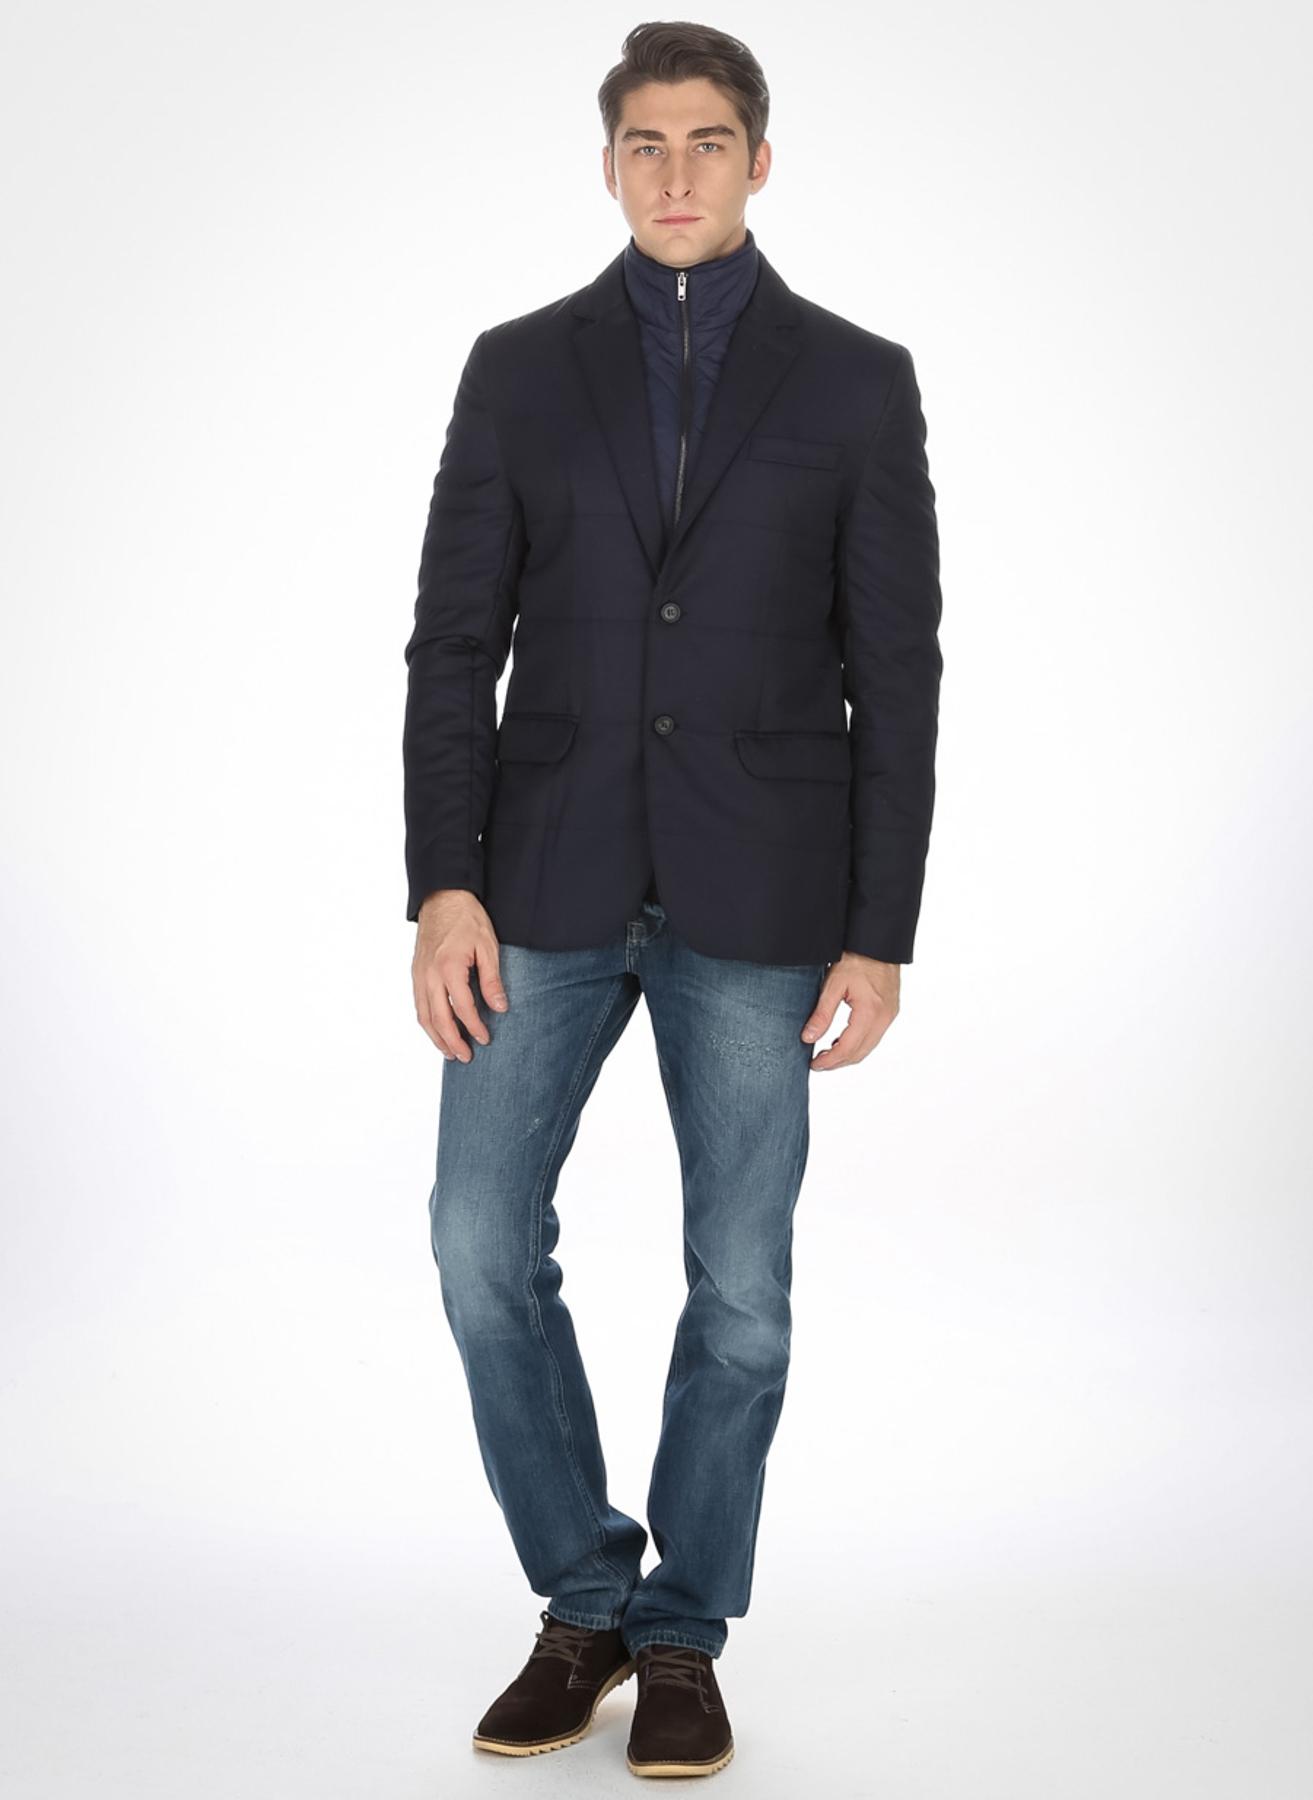 XL Siyah Pi Ceket 5000042123004 Erkek Giyim & Yelek